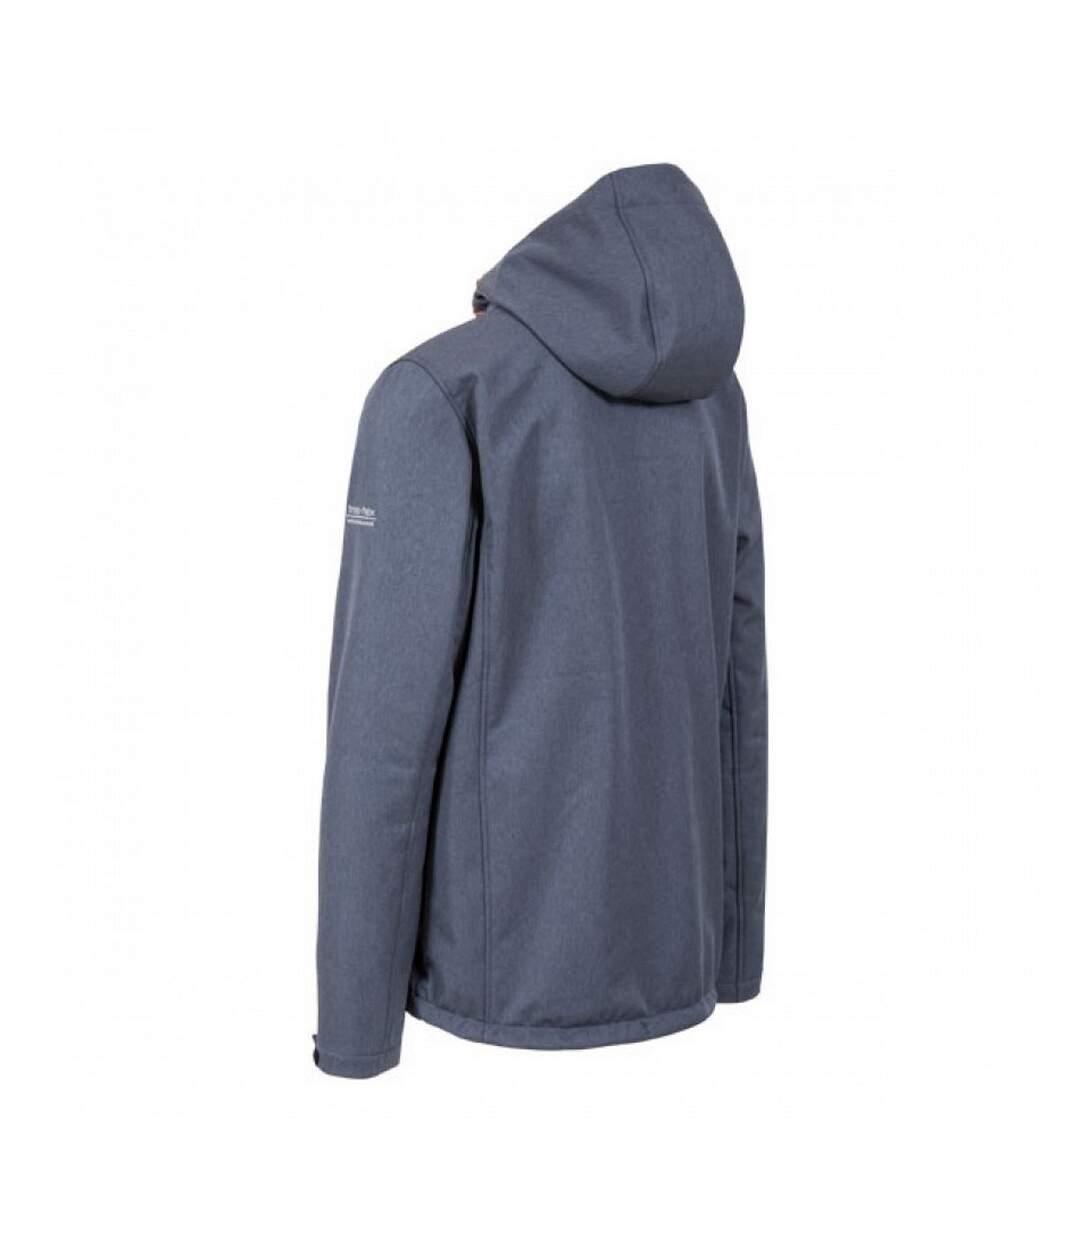 Trespass - Veste Softshell Taye - Homme (Bleu marine chiné) - UTTP3798